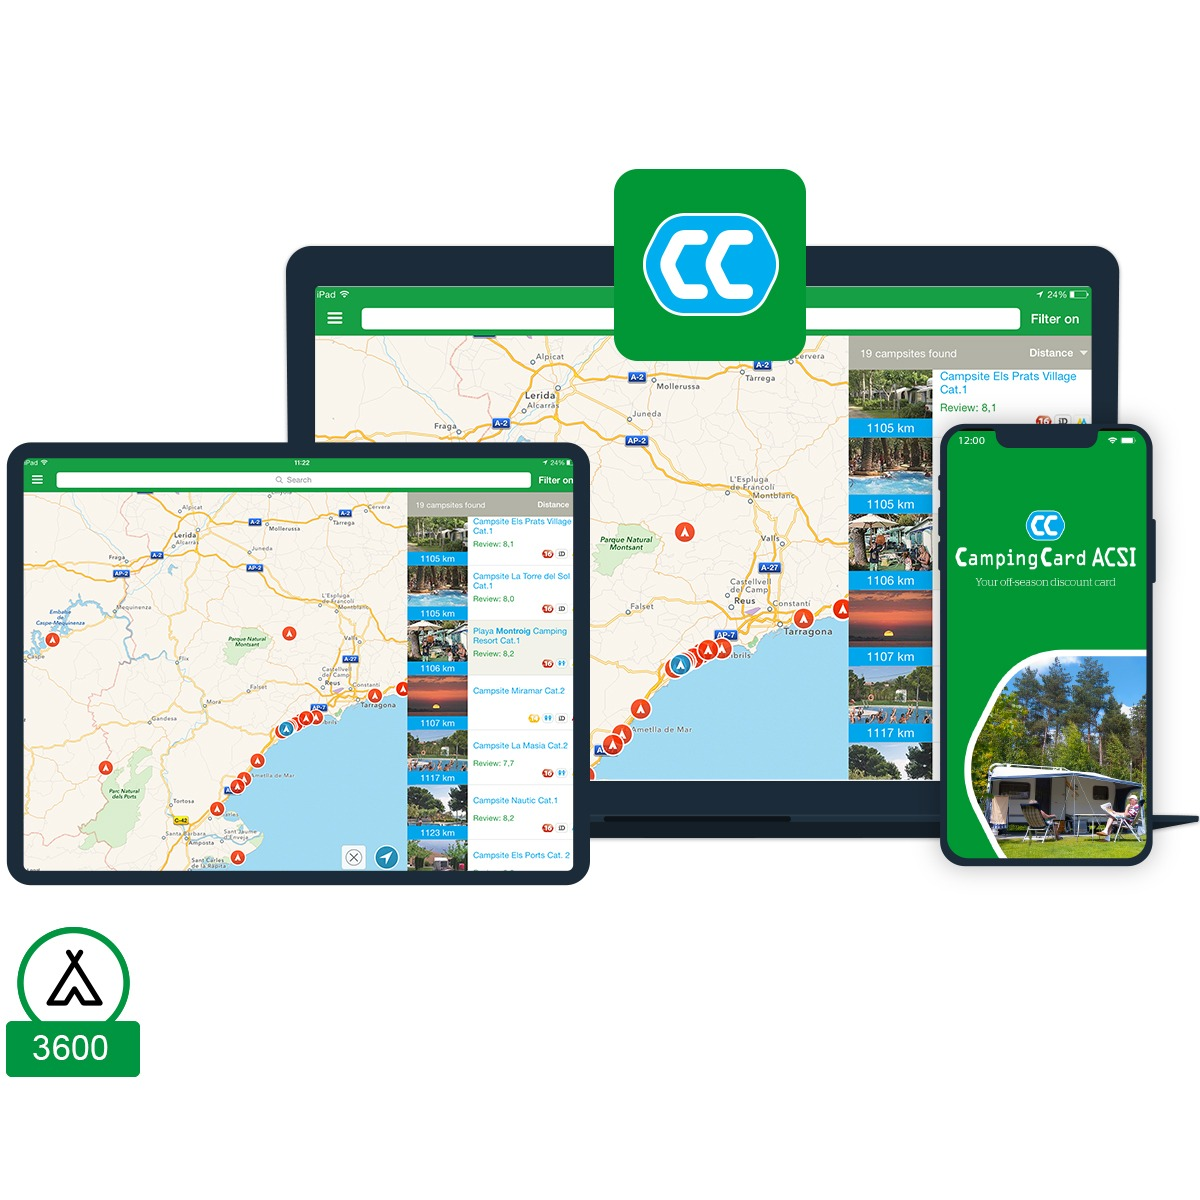 CampingCard ACSI-appen 2020 (campingar)